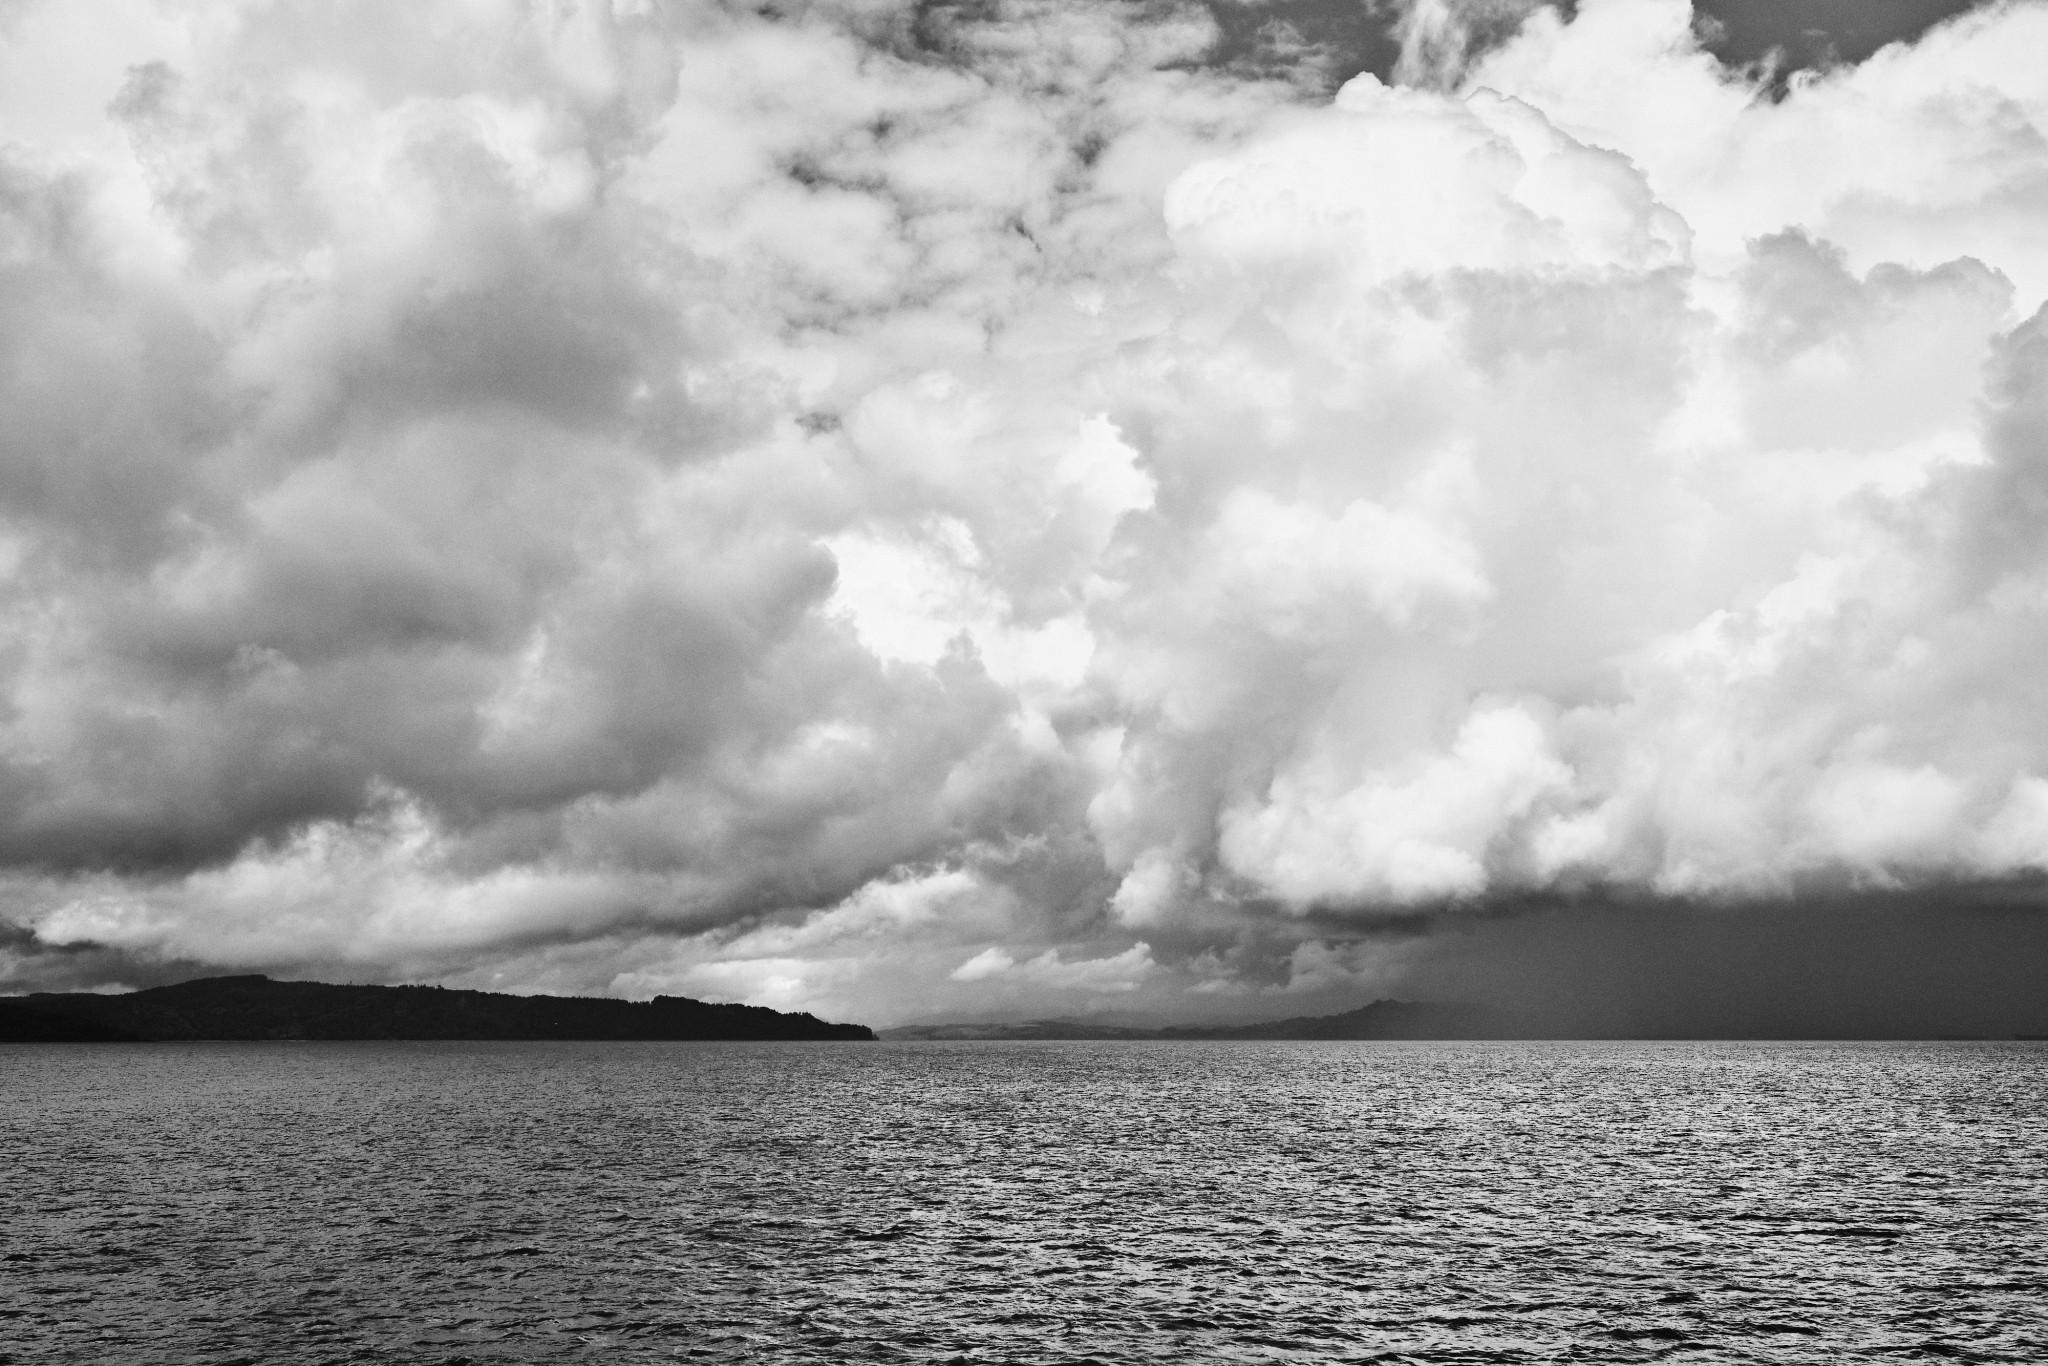 01-Storm.jpg